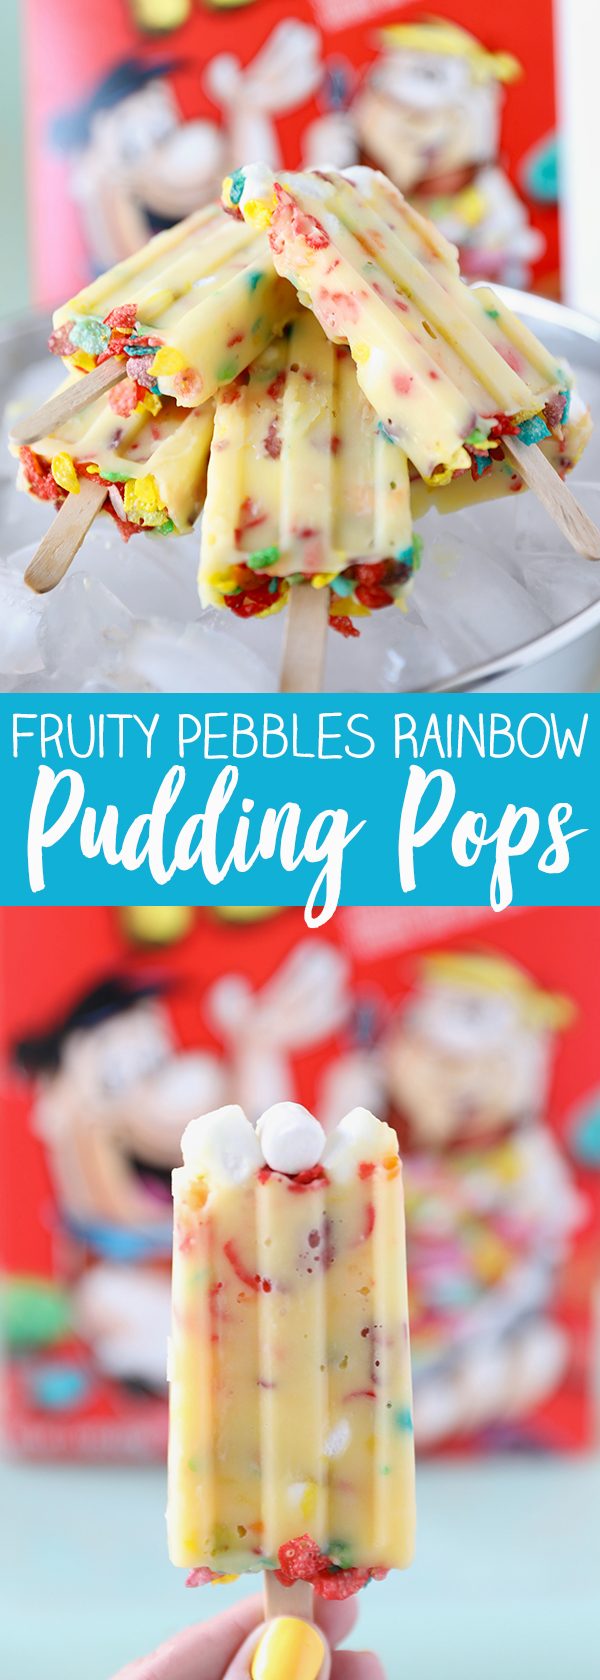 Fruity Pebbles Rainbow Pudding Pops